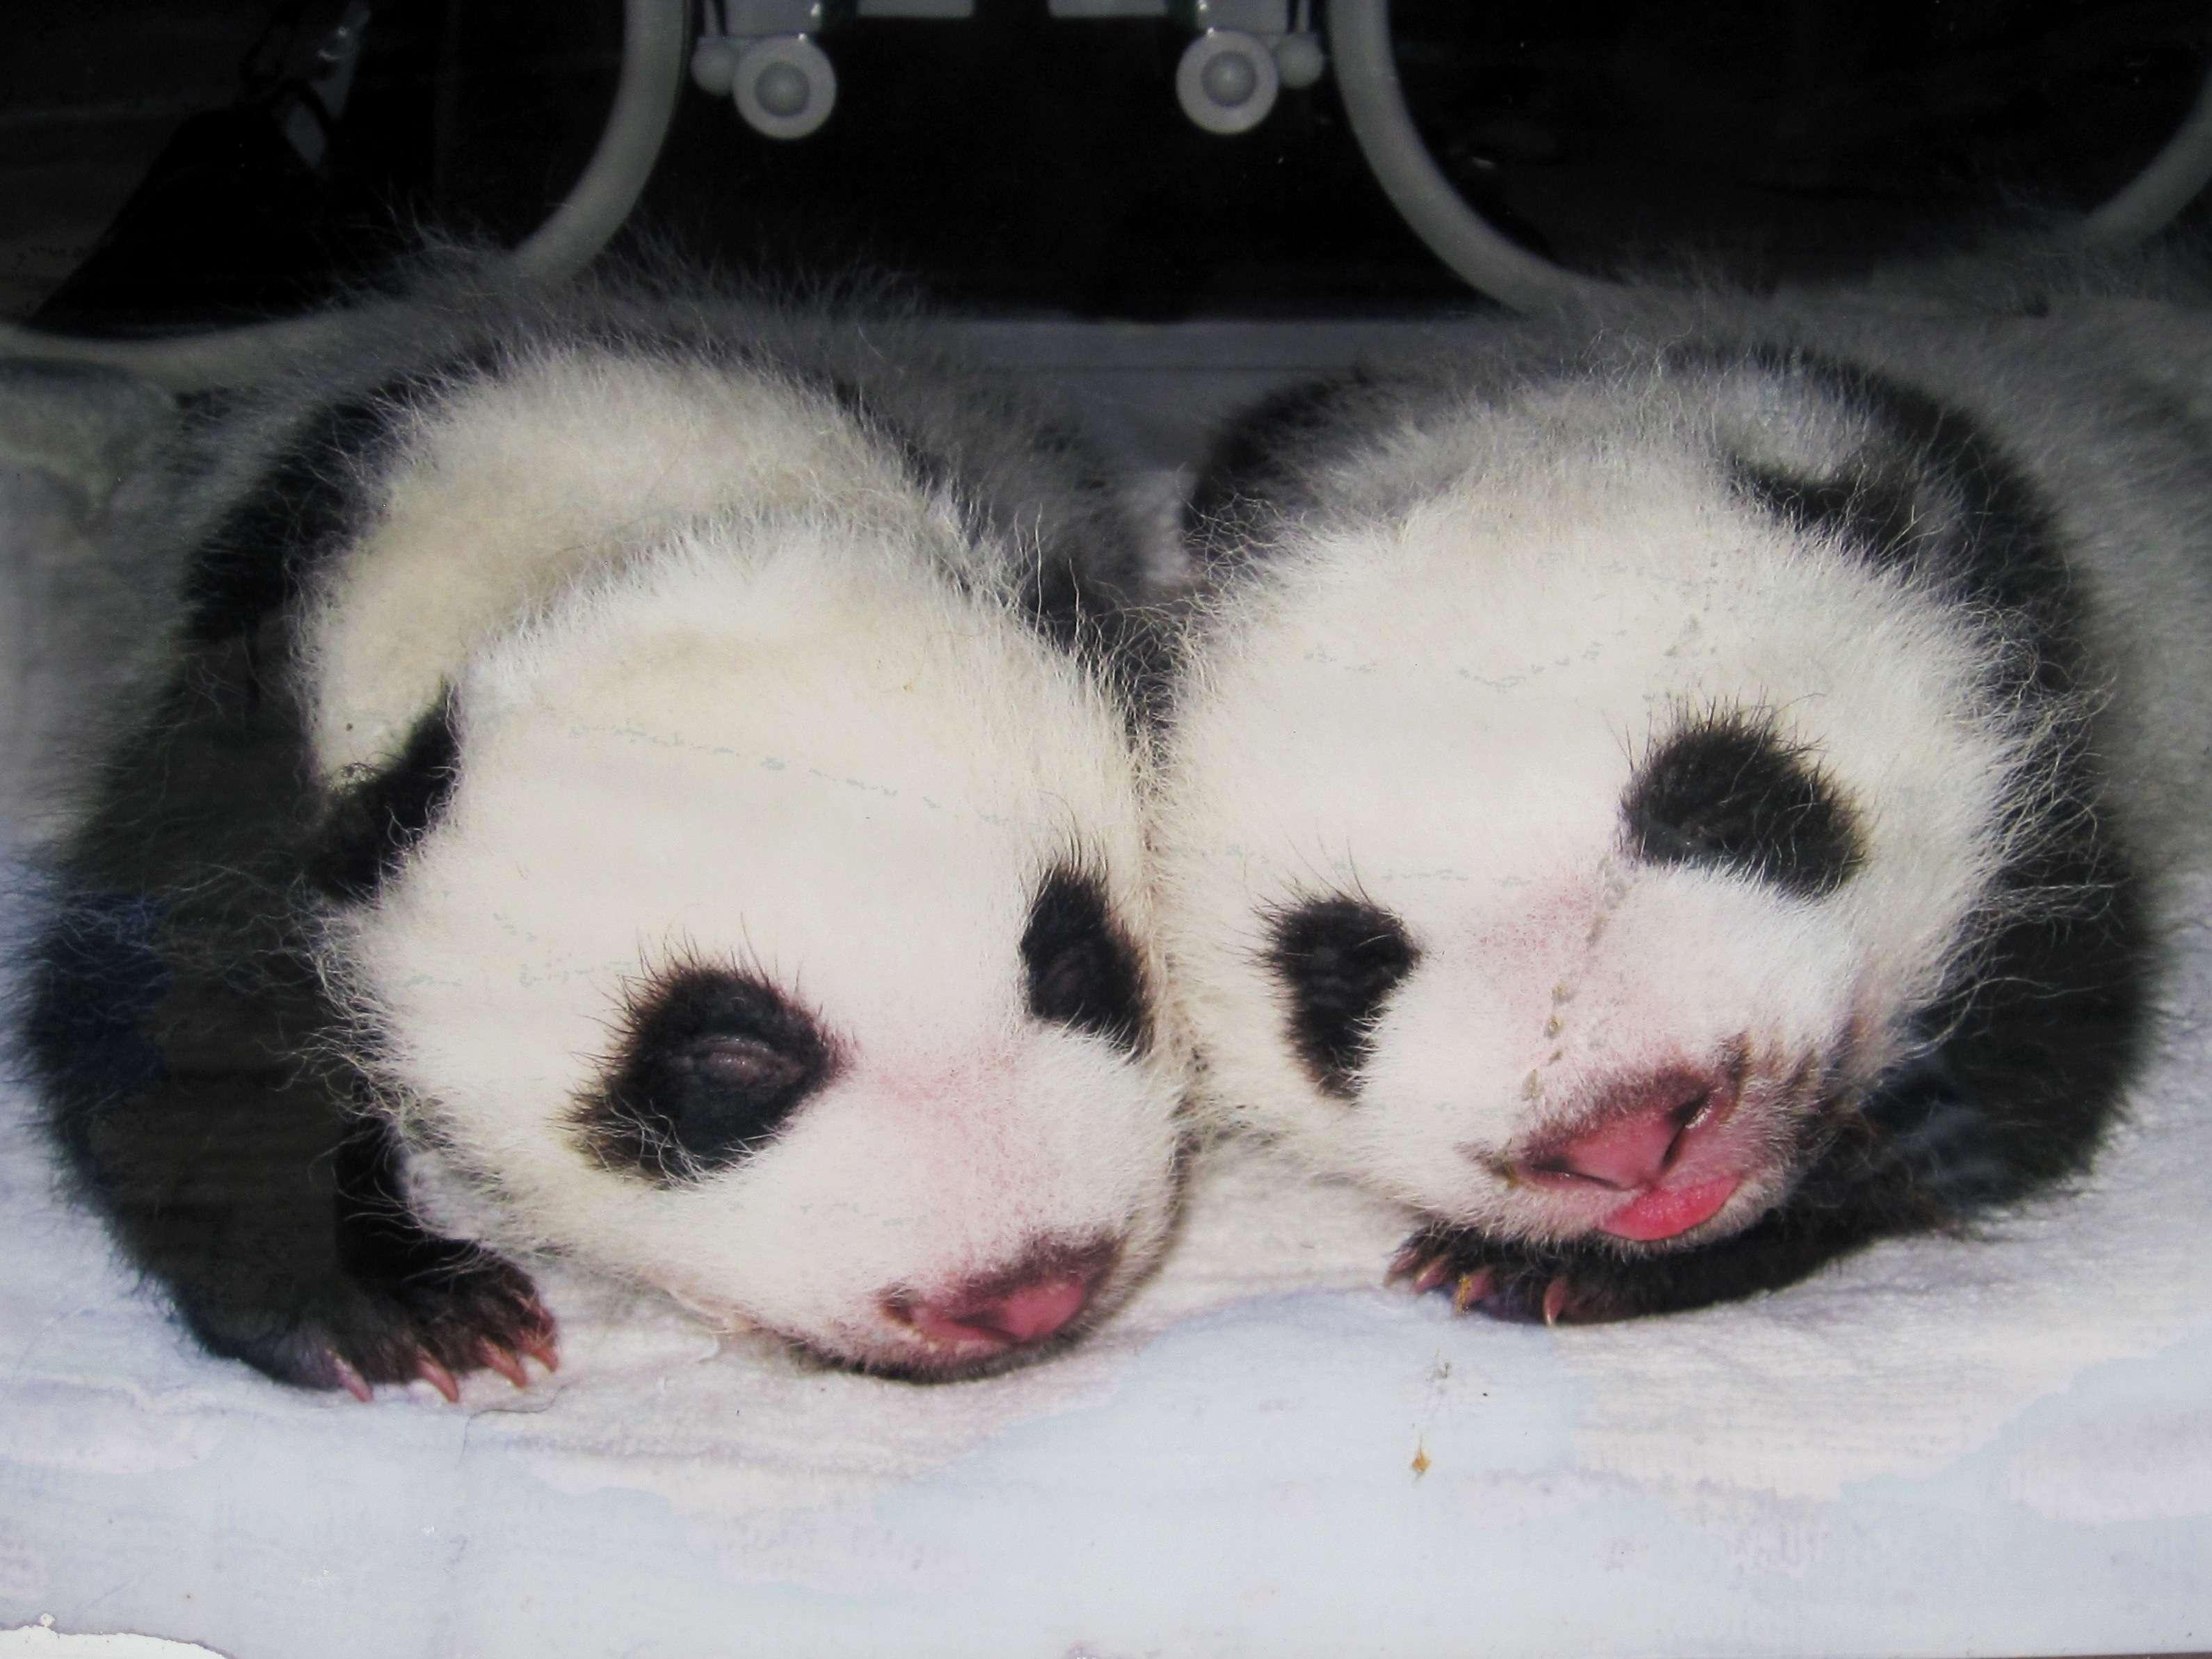 Giant Pandas Chengdu Research Center